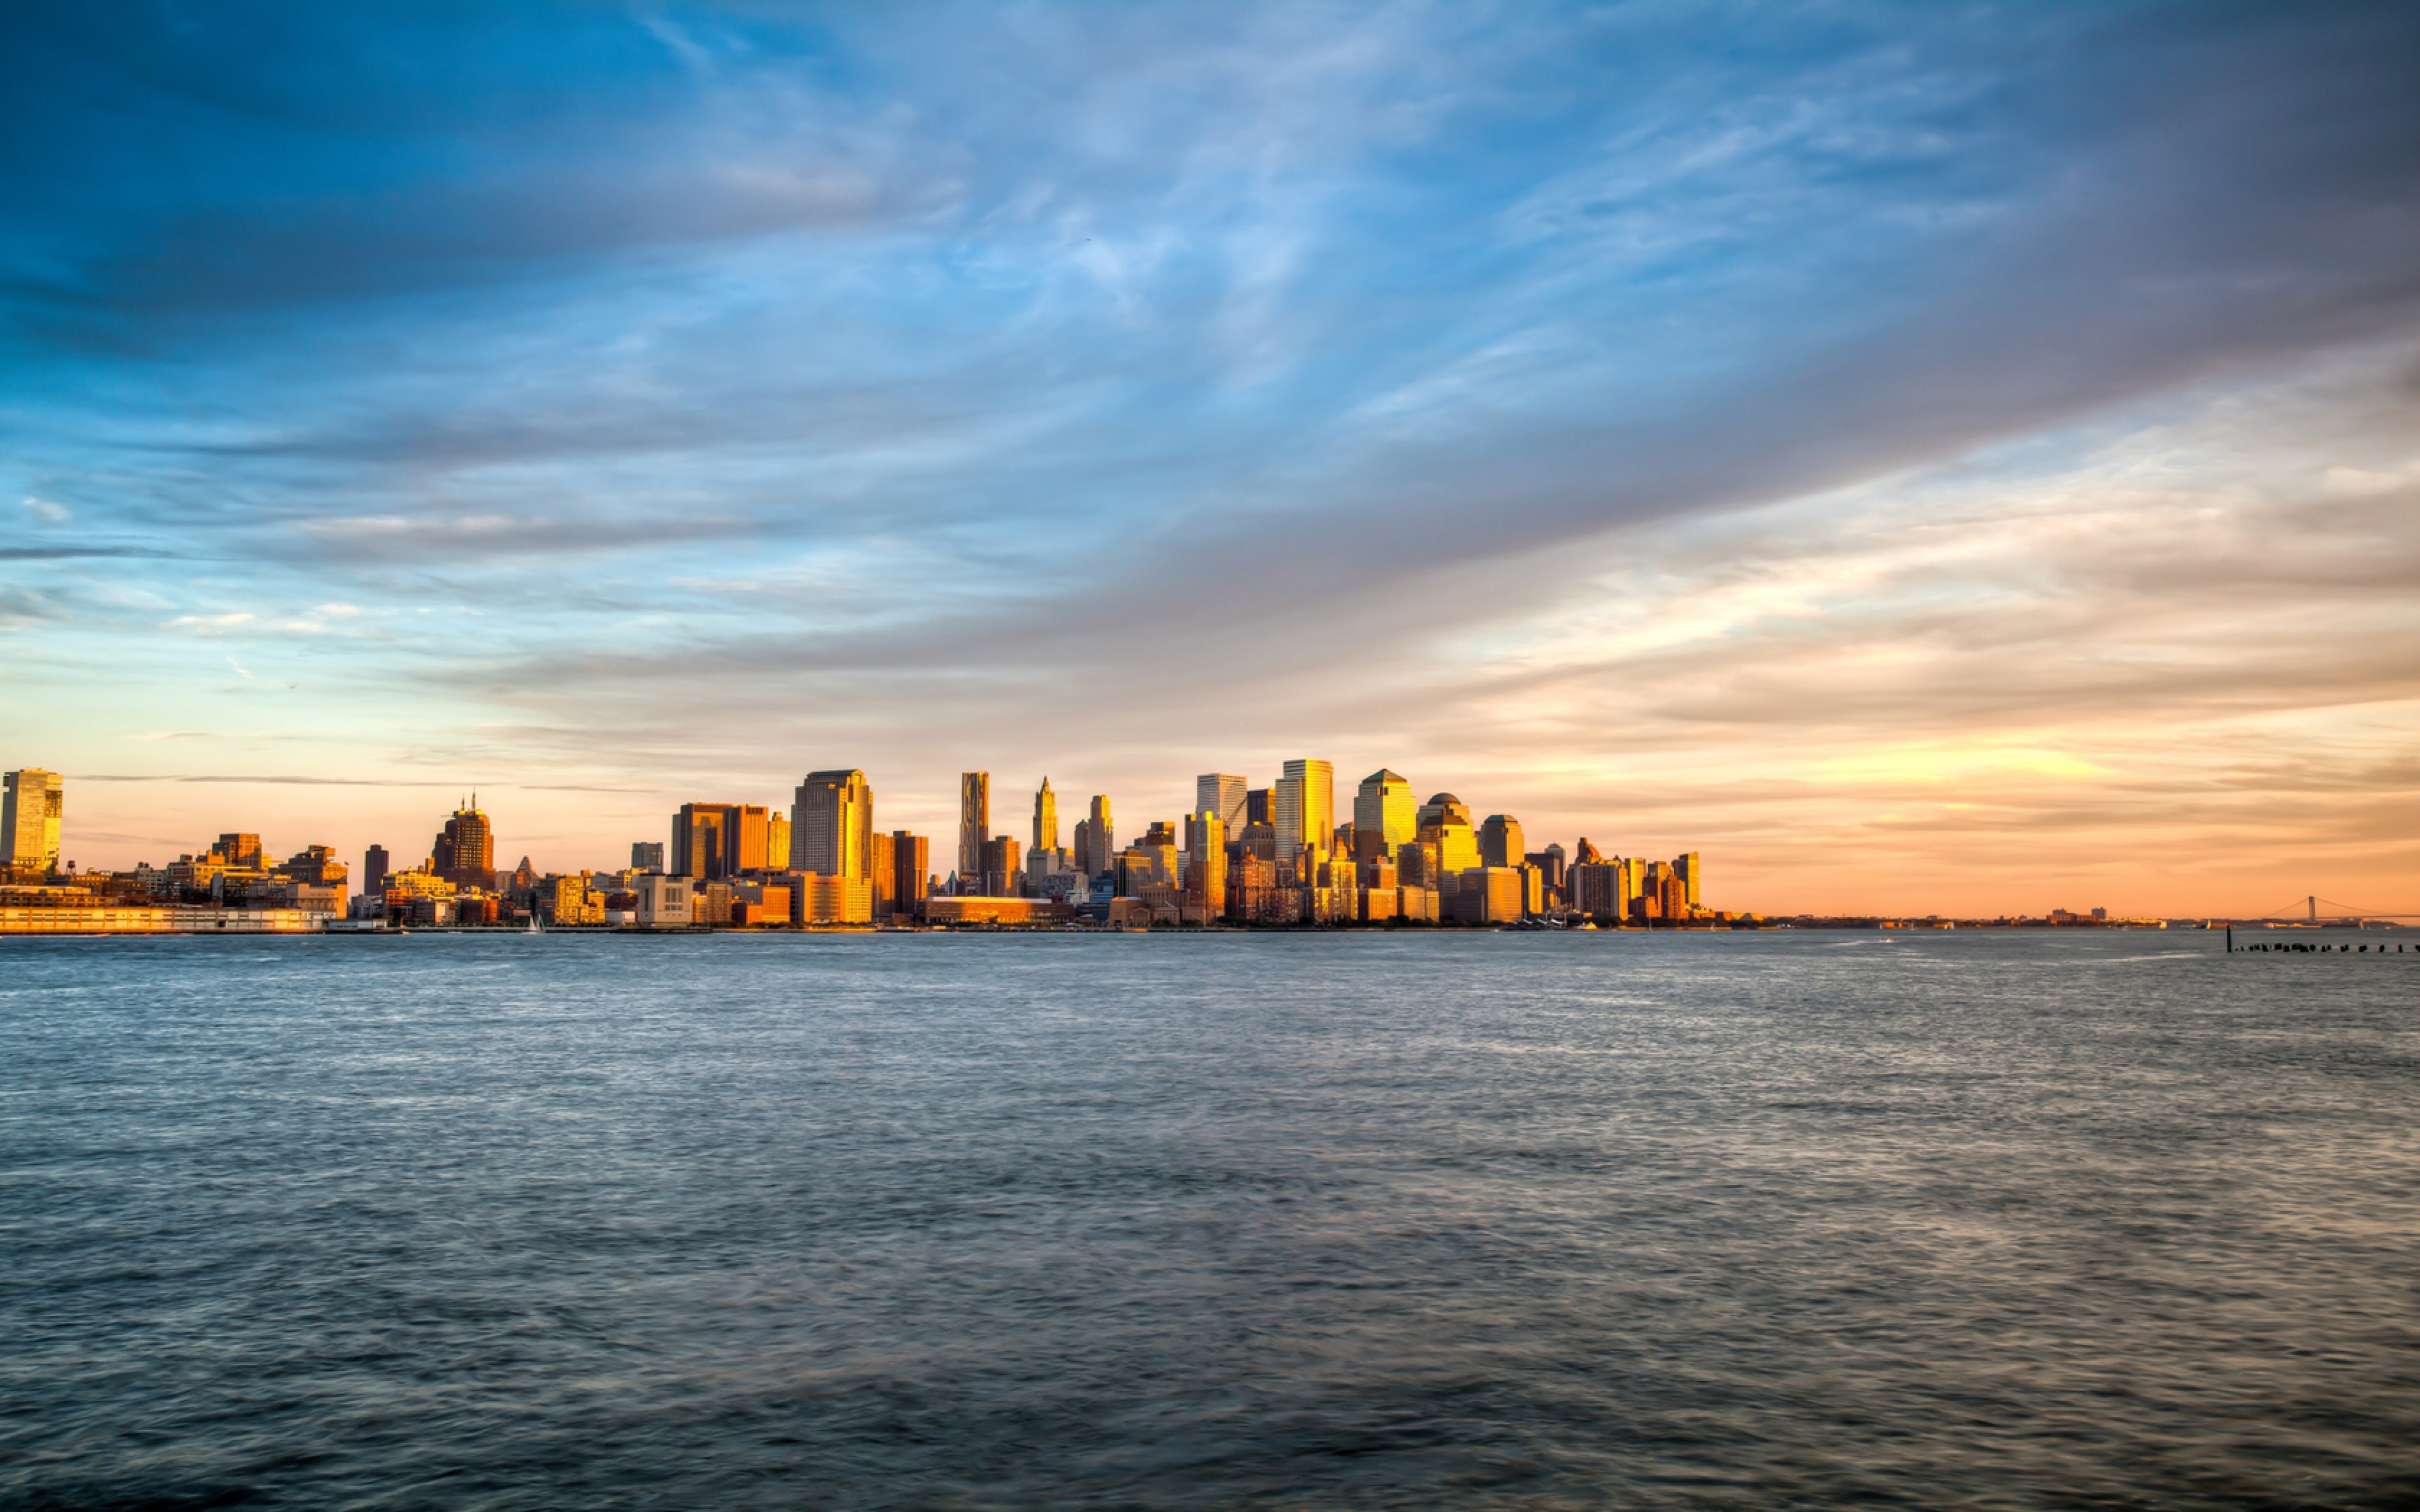 Free New York City USA America skyline HD Desktop wallpapers backgrounds wall murals downloads A5